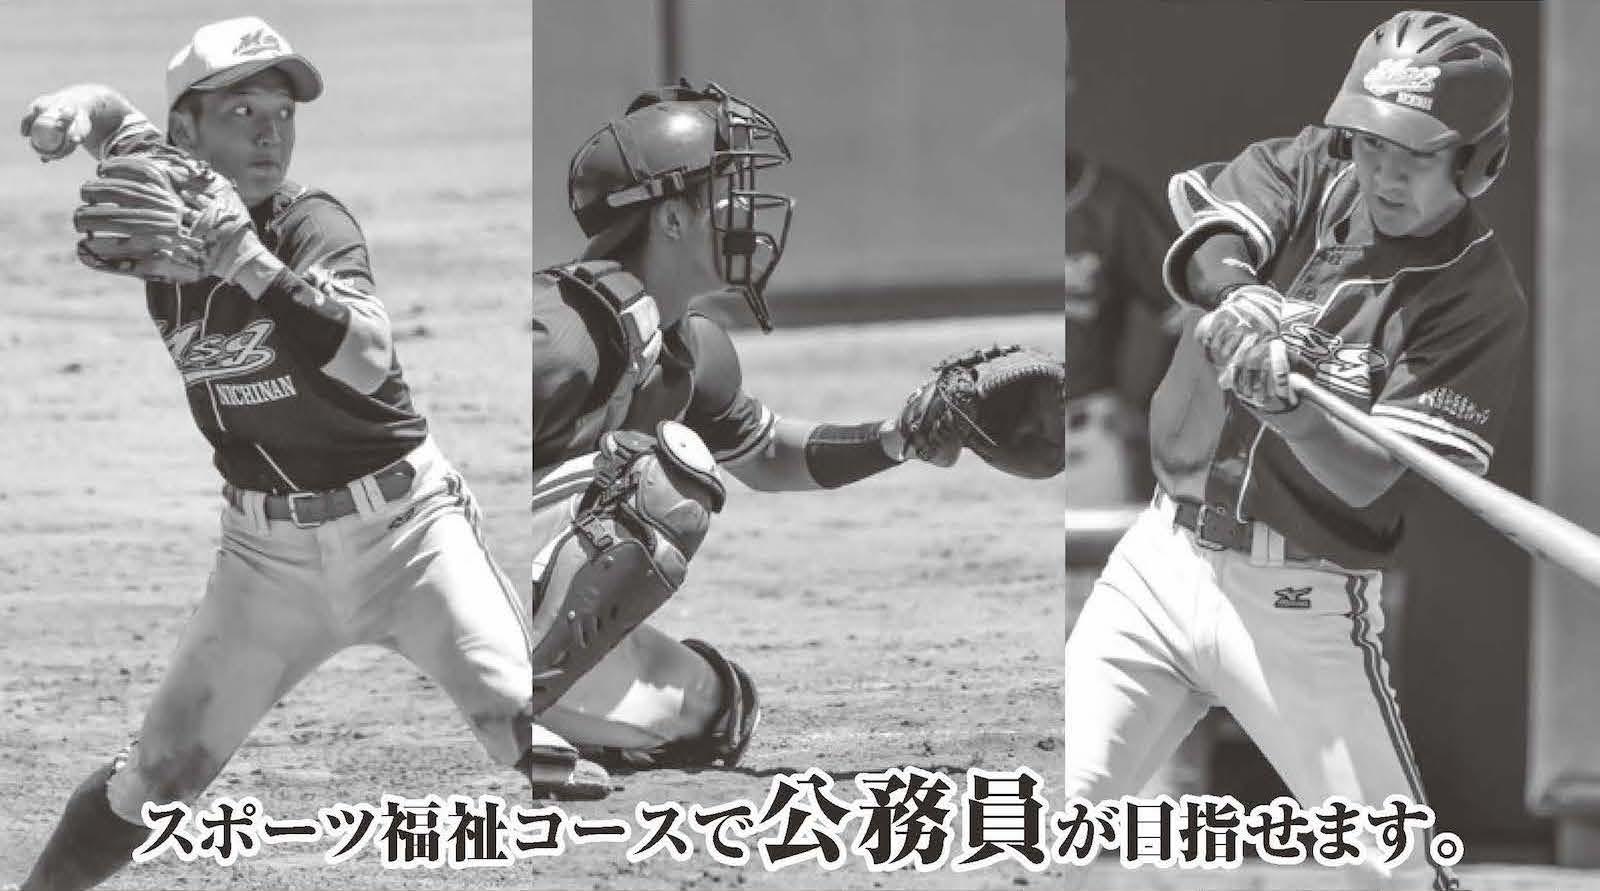 【PR】高校球児を応援!野球セレクション